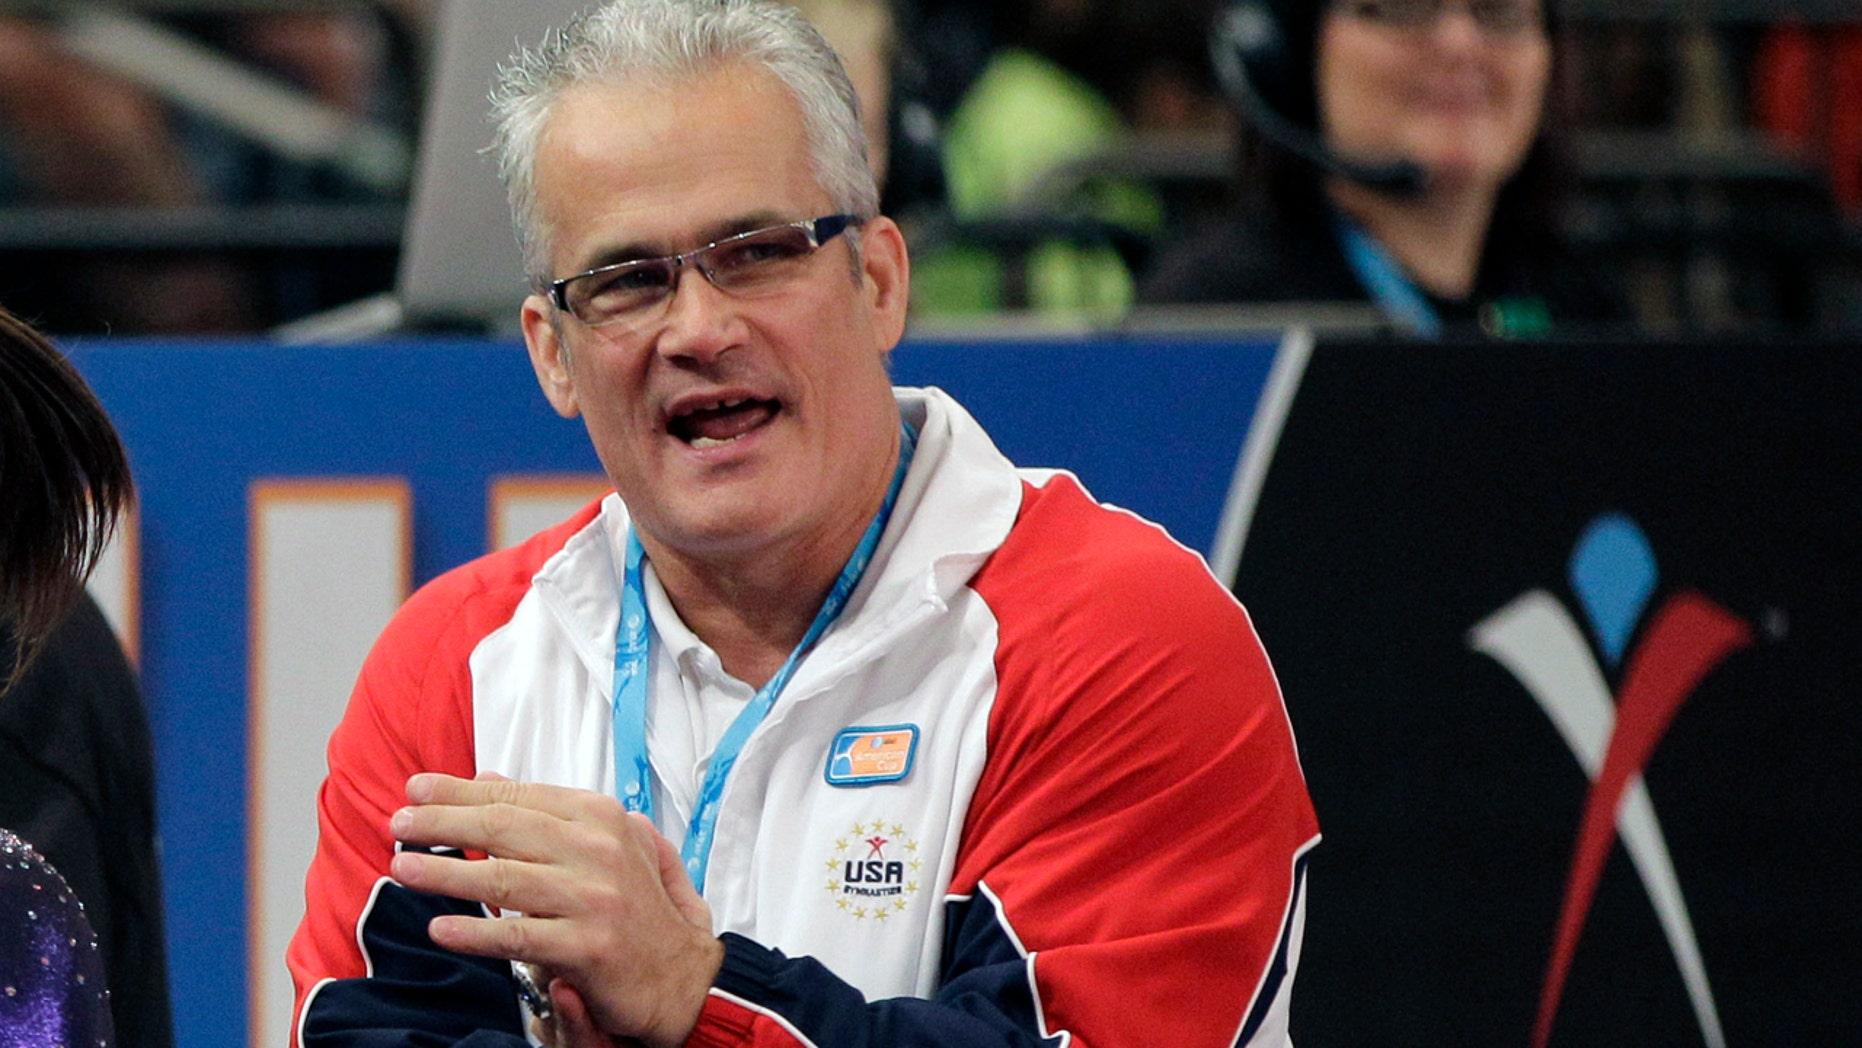 John Geddert was the head coach of the U.S. gymnastics team at the 2012 Summer Olympics in London.